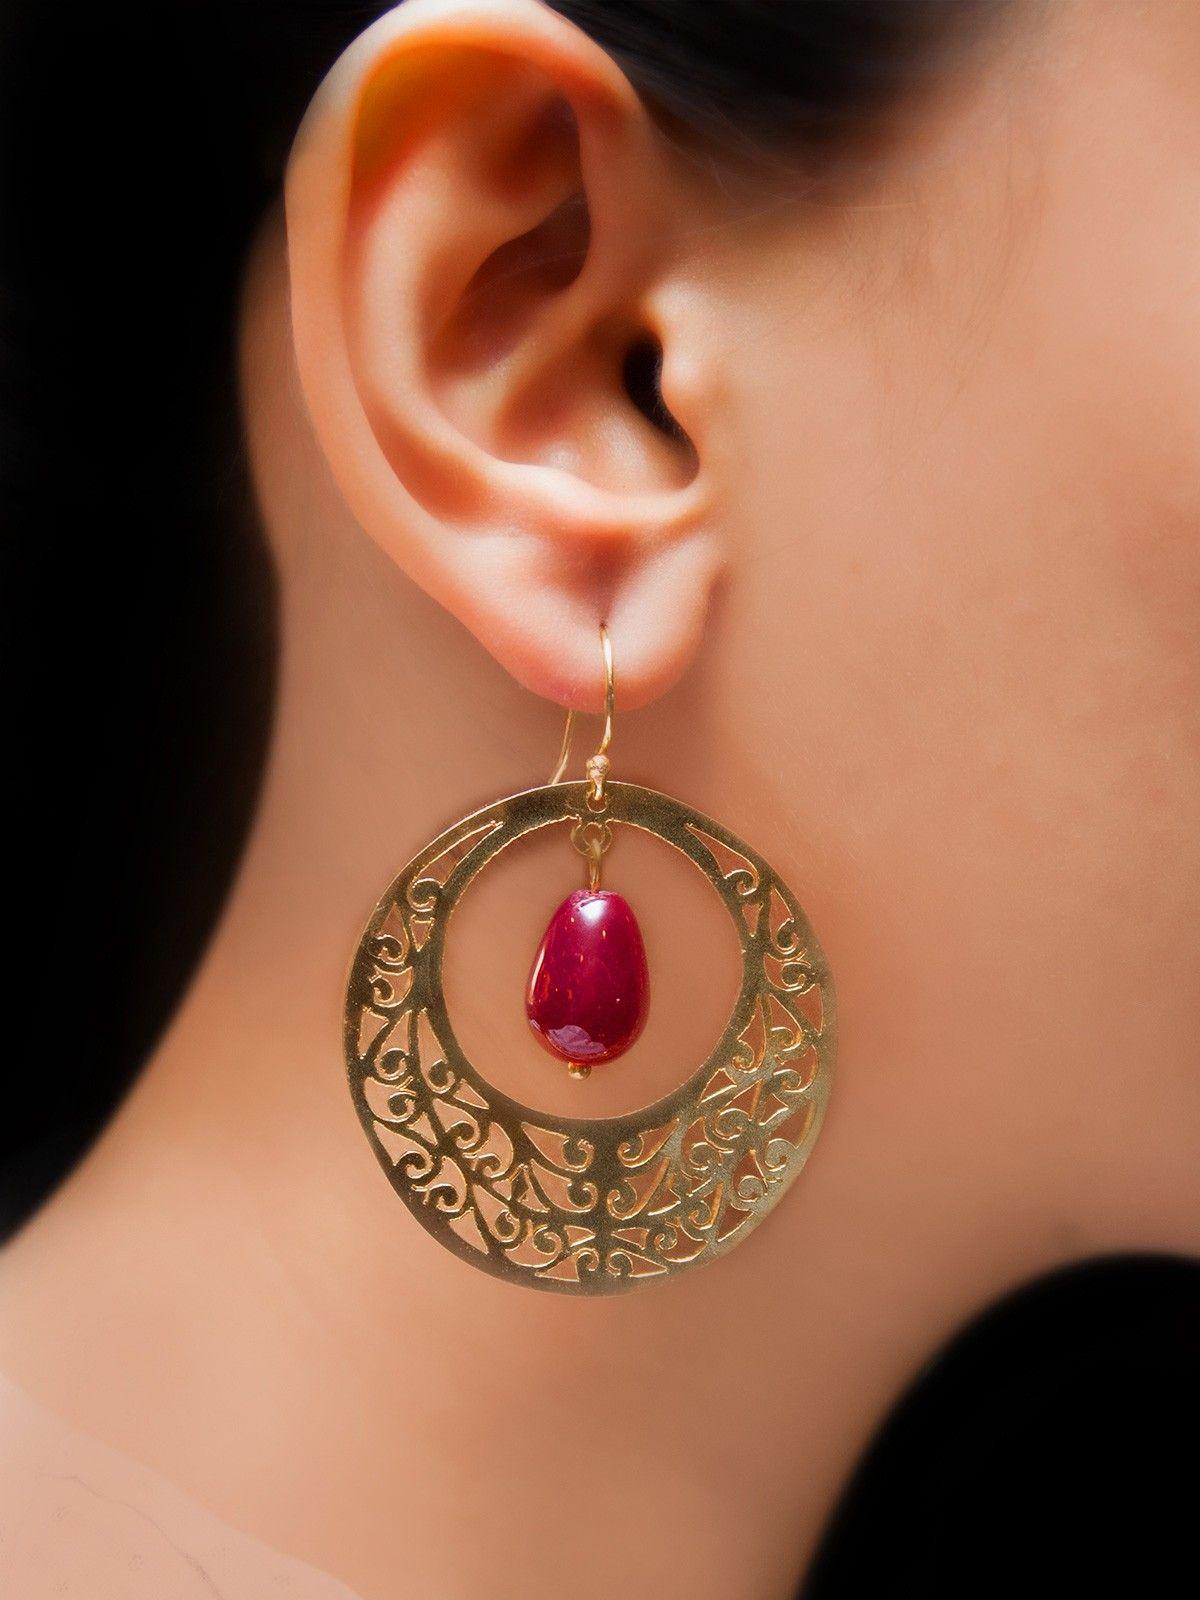 Maroon full moon earrings